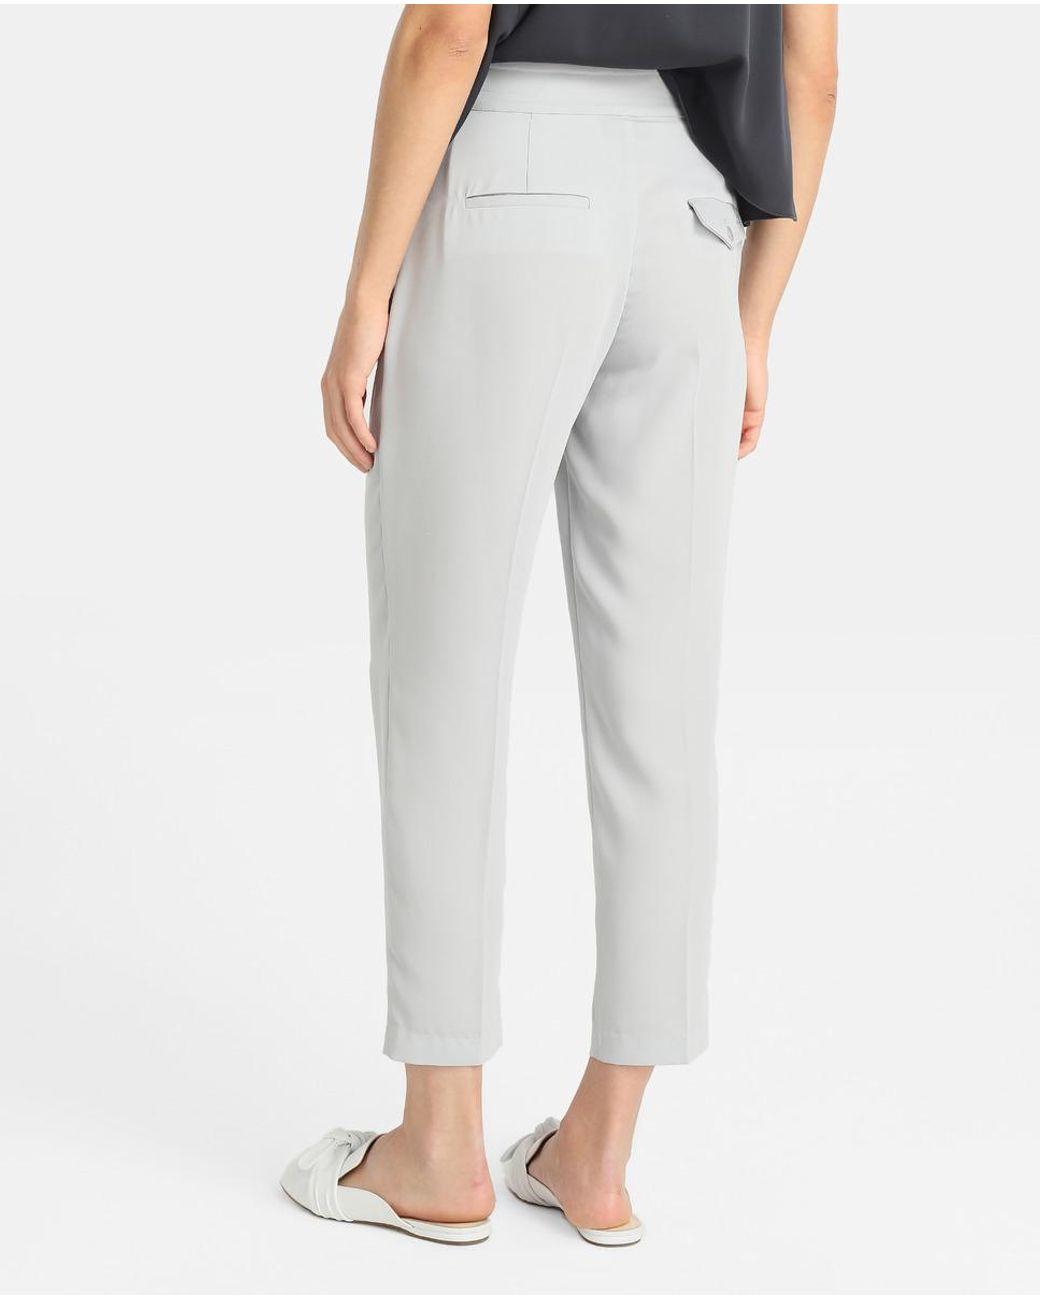 Pantalones Woznx08npk para grises Mujer perla mujer gris Cigarrillo lKcFJ1